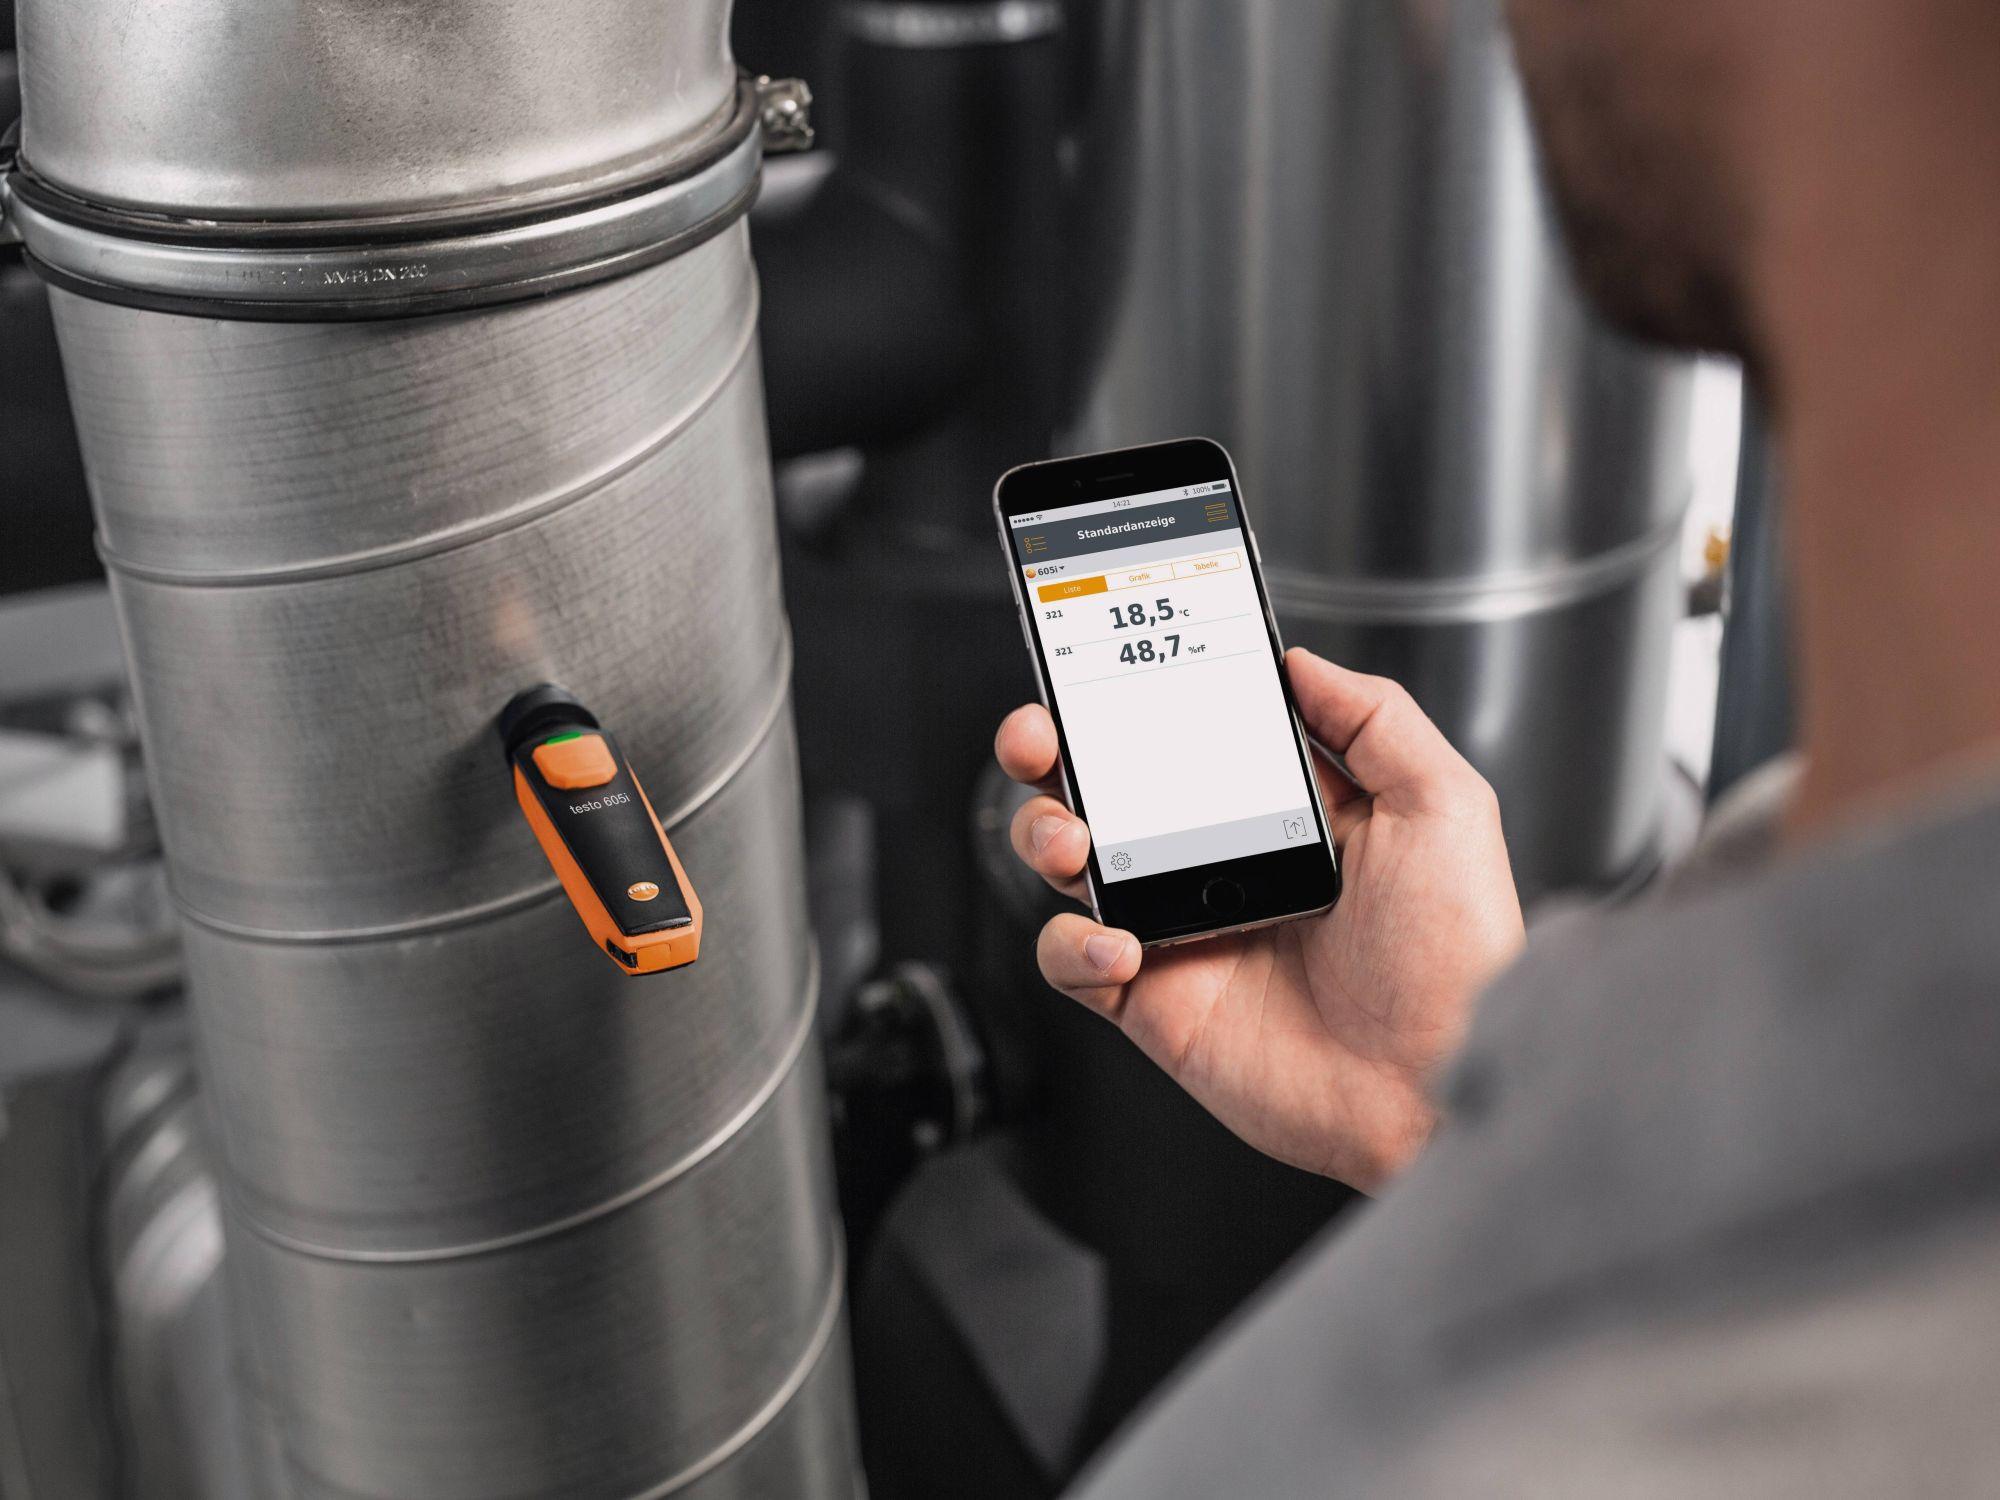 testo-605i-humidity-app-18.5-horiz-DE.jpg